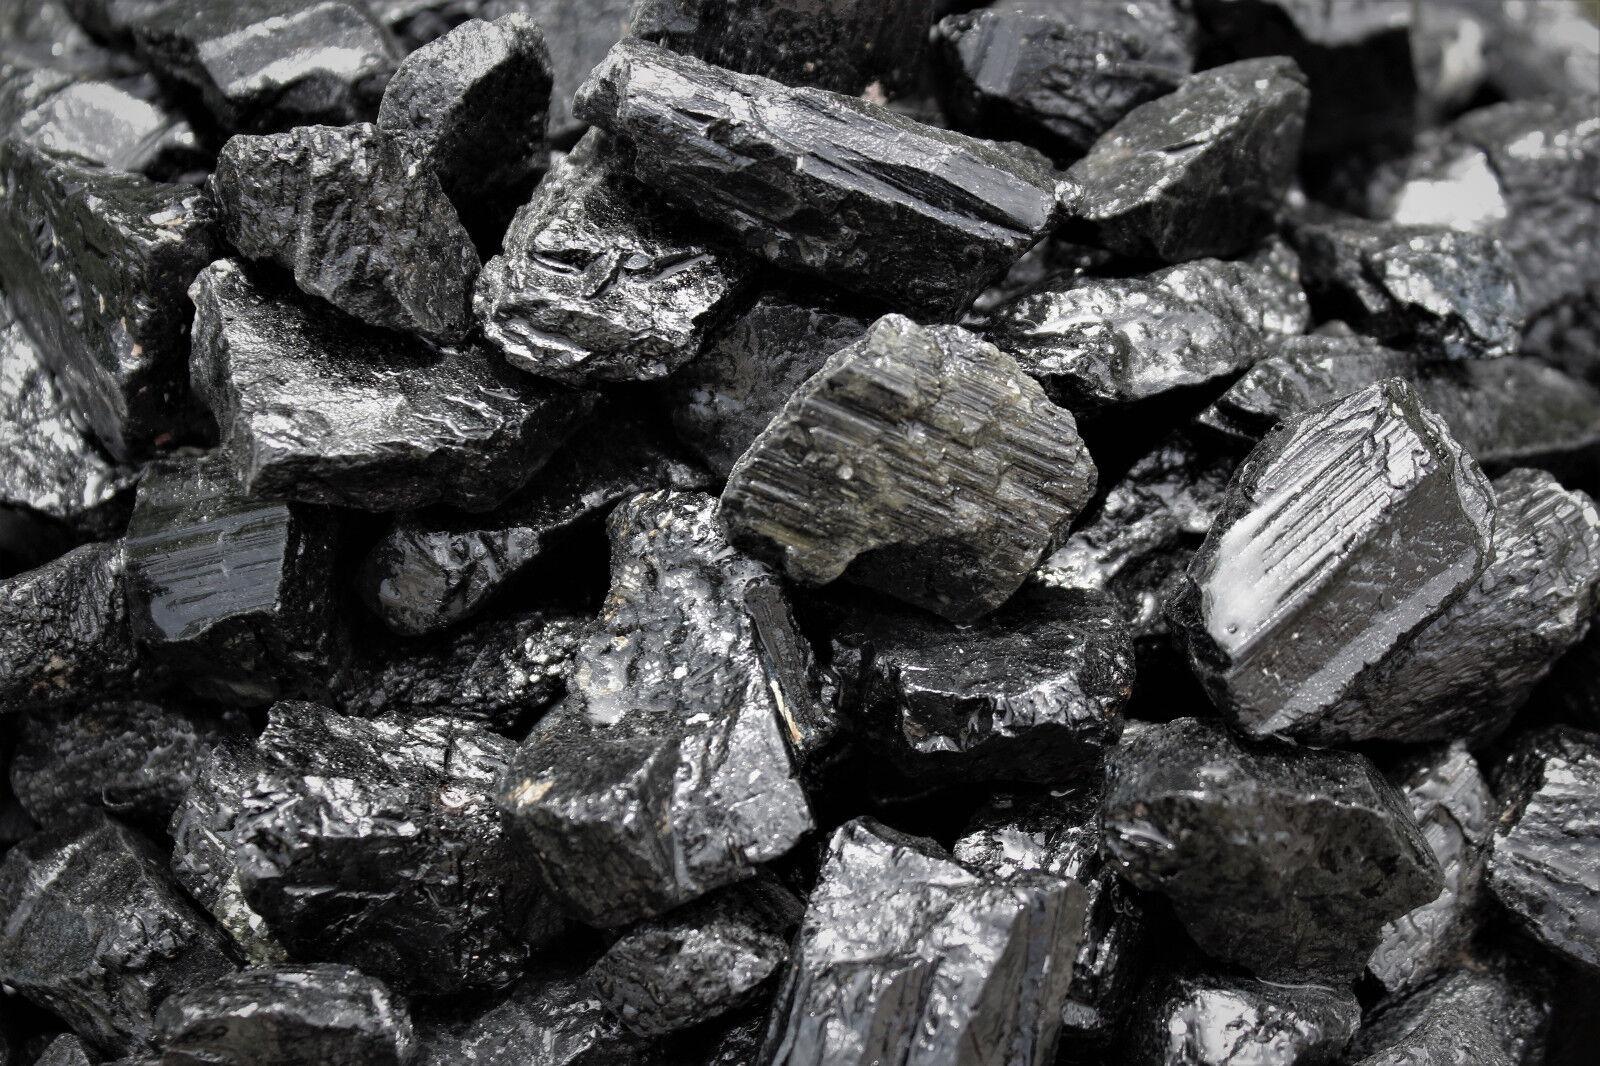 Raw Rough Natural Stones: Choose Type (Gemstone Reiki Crystal Specimen) LIST A